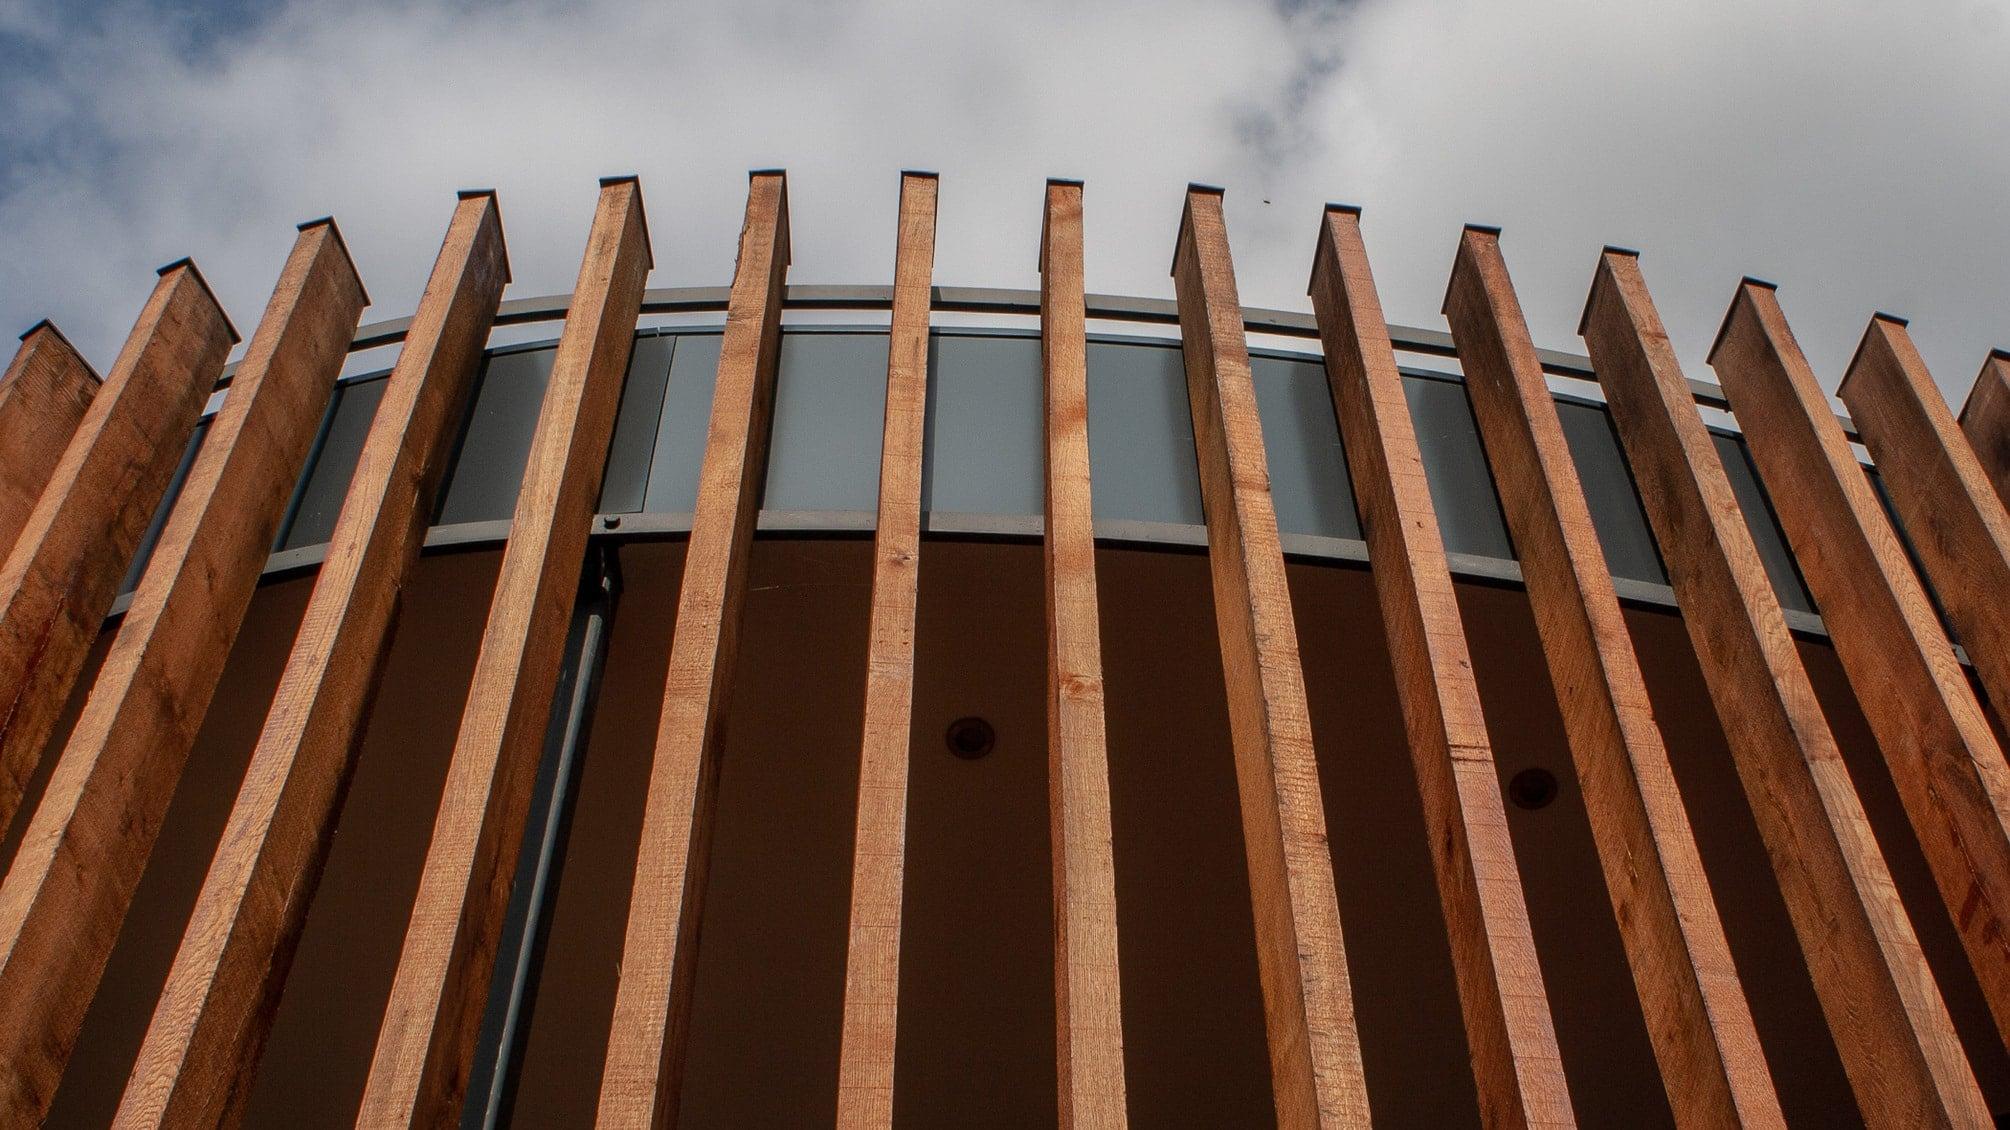 Fassadenverkleidung der Vinothek Regnery